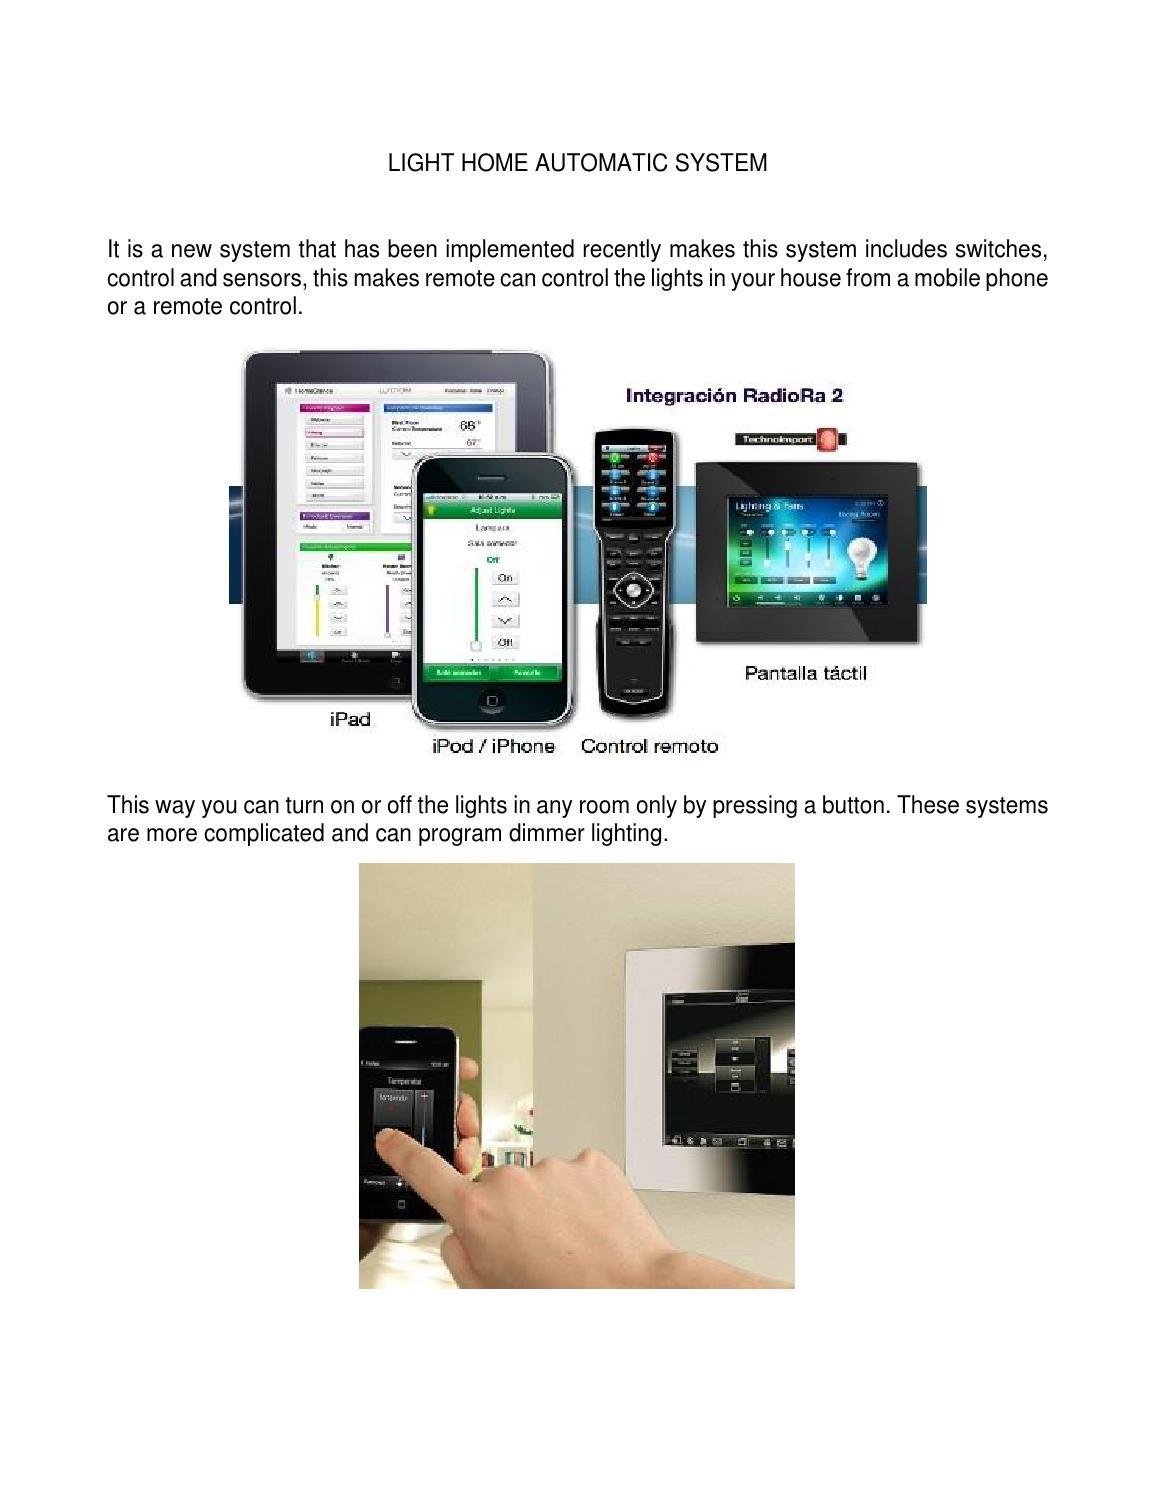 Light Home Automatic System 11 By Mariadanna Issuu Radiora 2 3 Way Switch